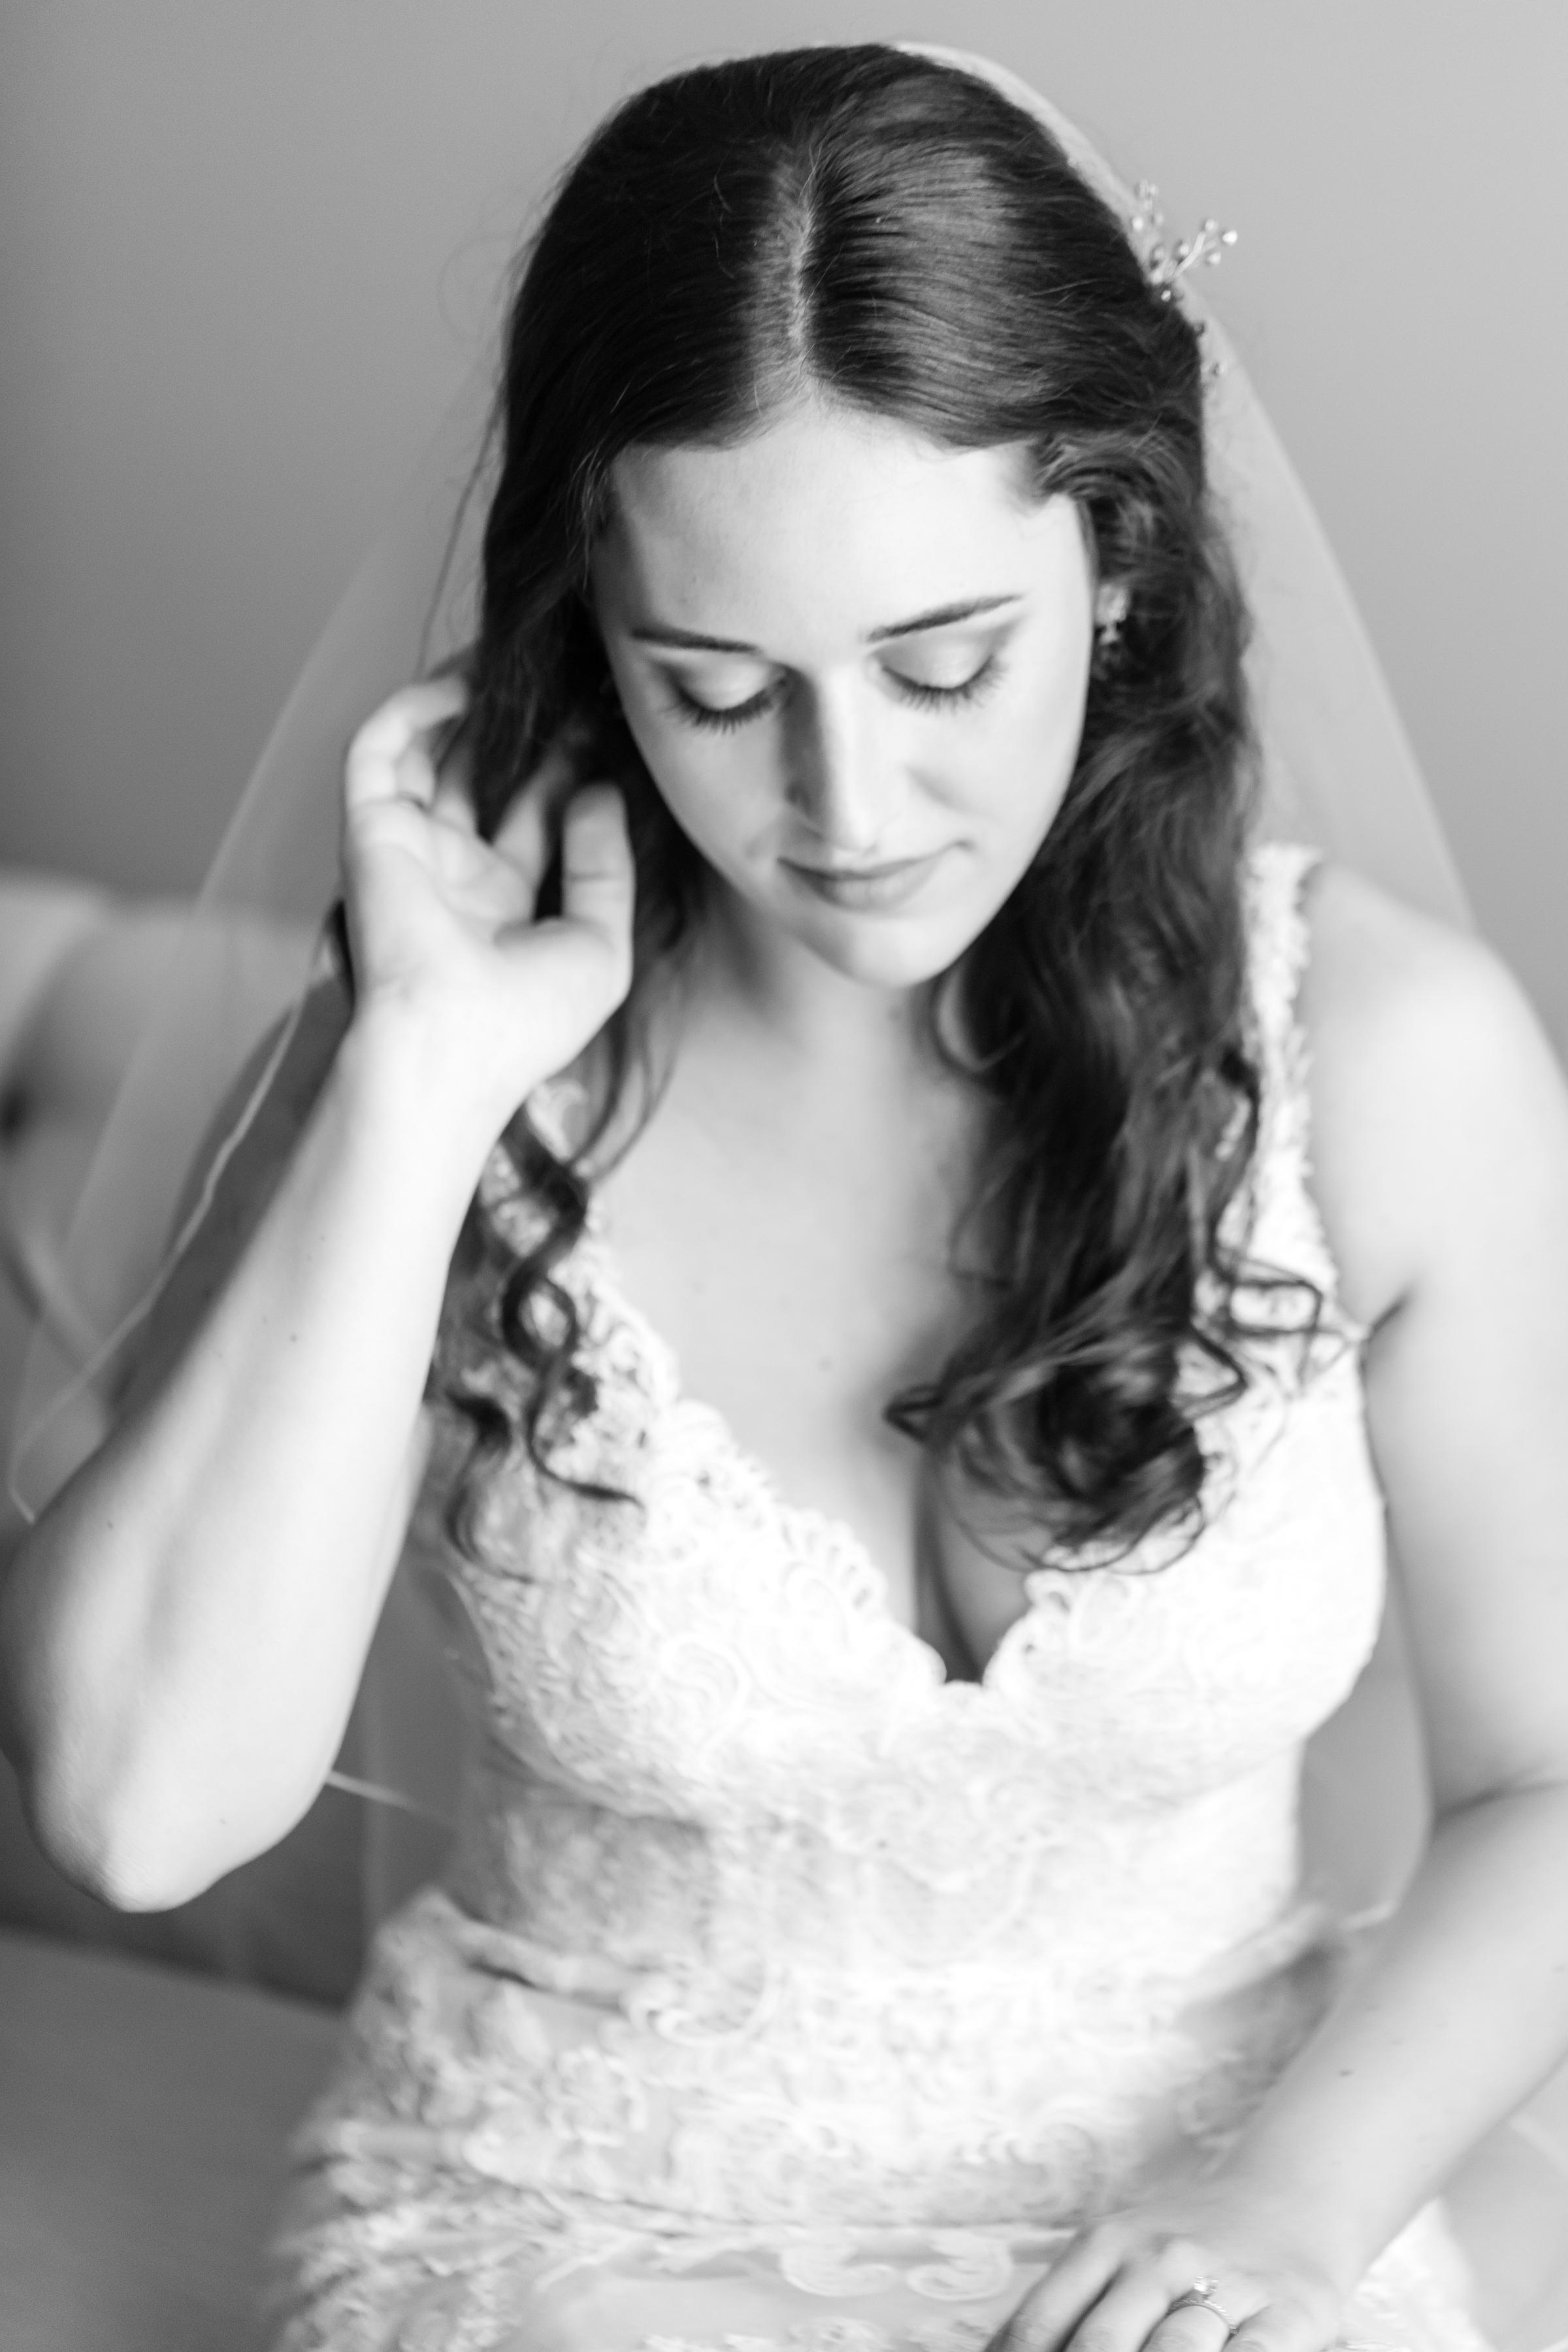 brielle-davis-events-kairos-photography-chandler-hill-wedding-bride.jpg